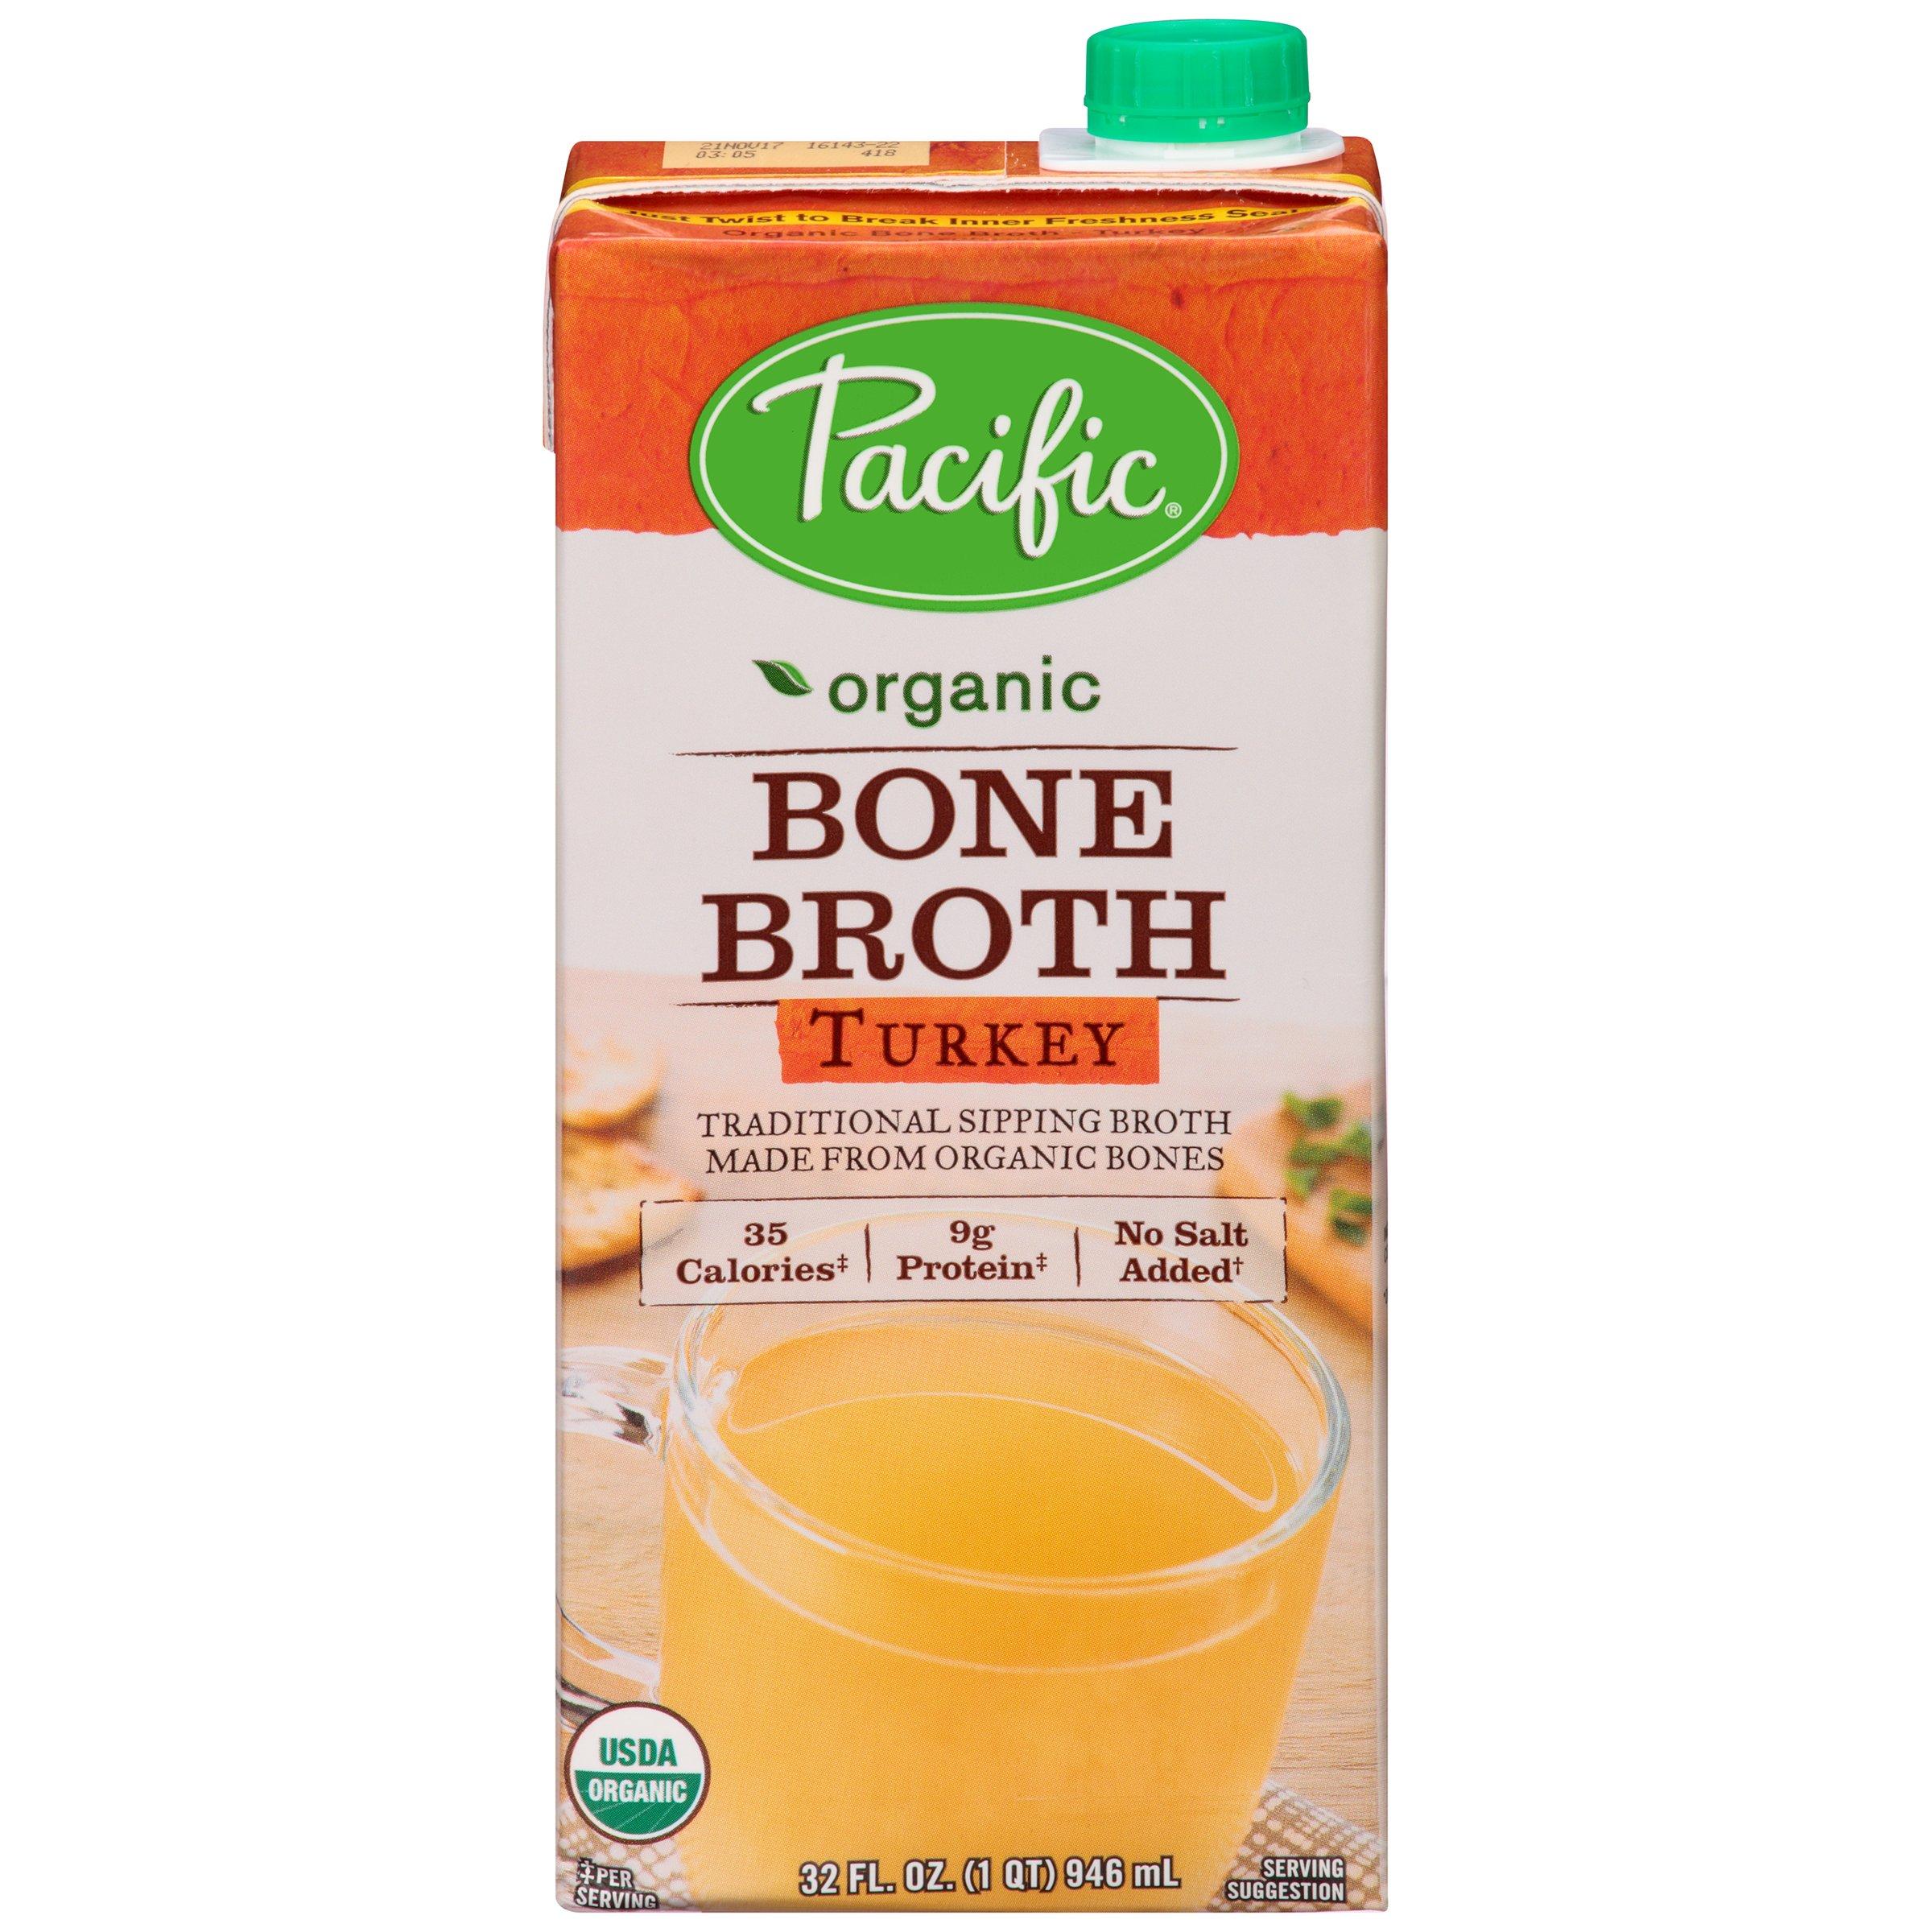 Organic Bone Broth, Turkey by Pacific Foods, 32oz Cartons, 12-Pack